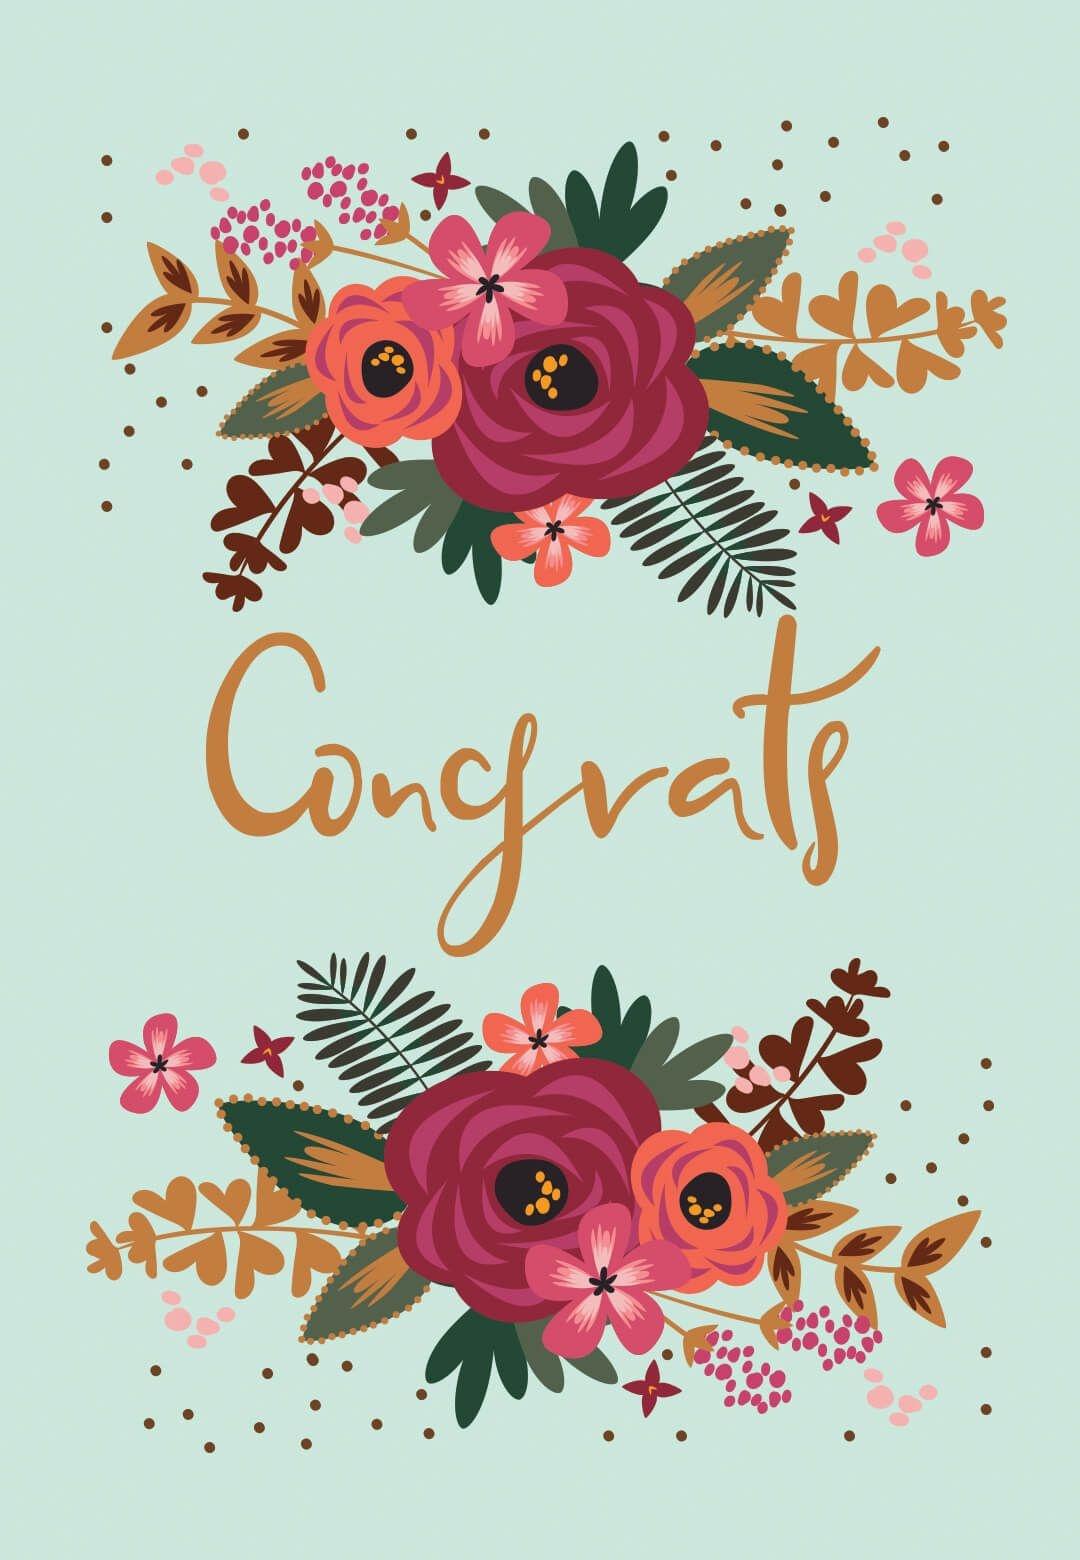 Floral Congrats - Free Printable Wedding Congratulations Card - Free Printable Congratulations Cards